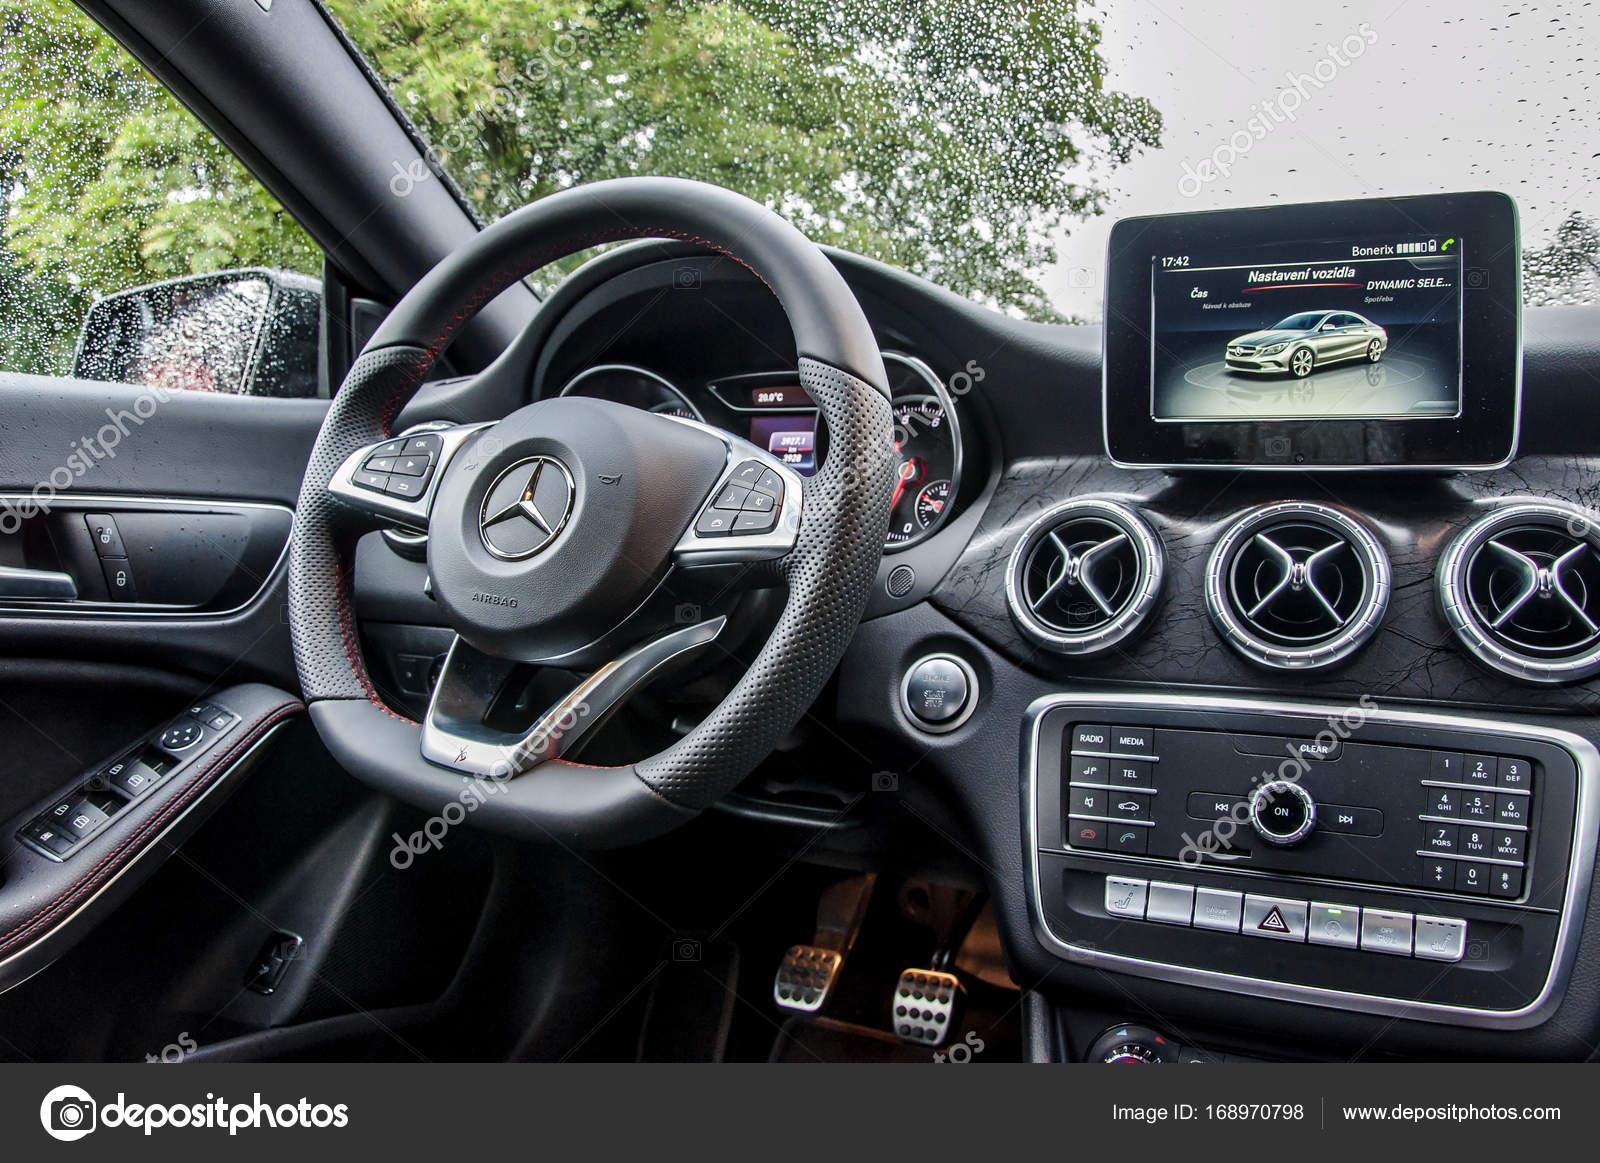 Luxury Car Interior Of Mercedes Benz Stock Editorial Photo